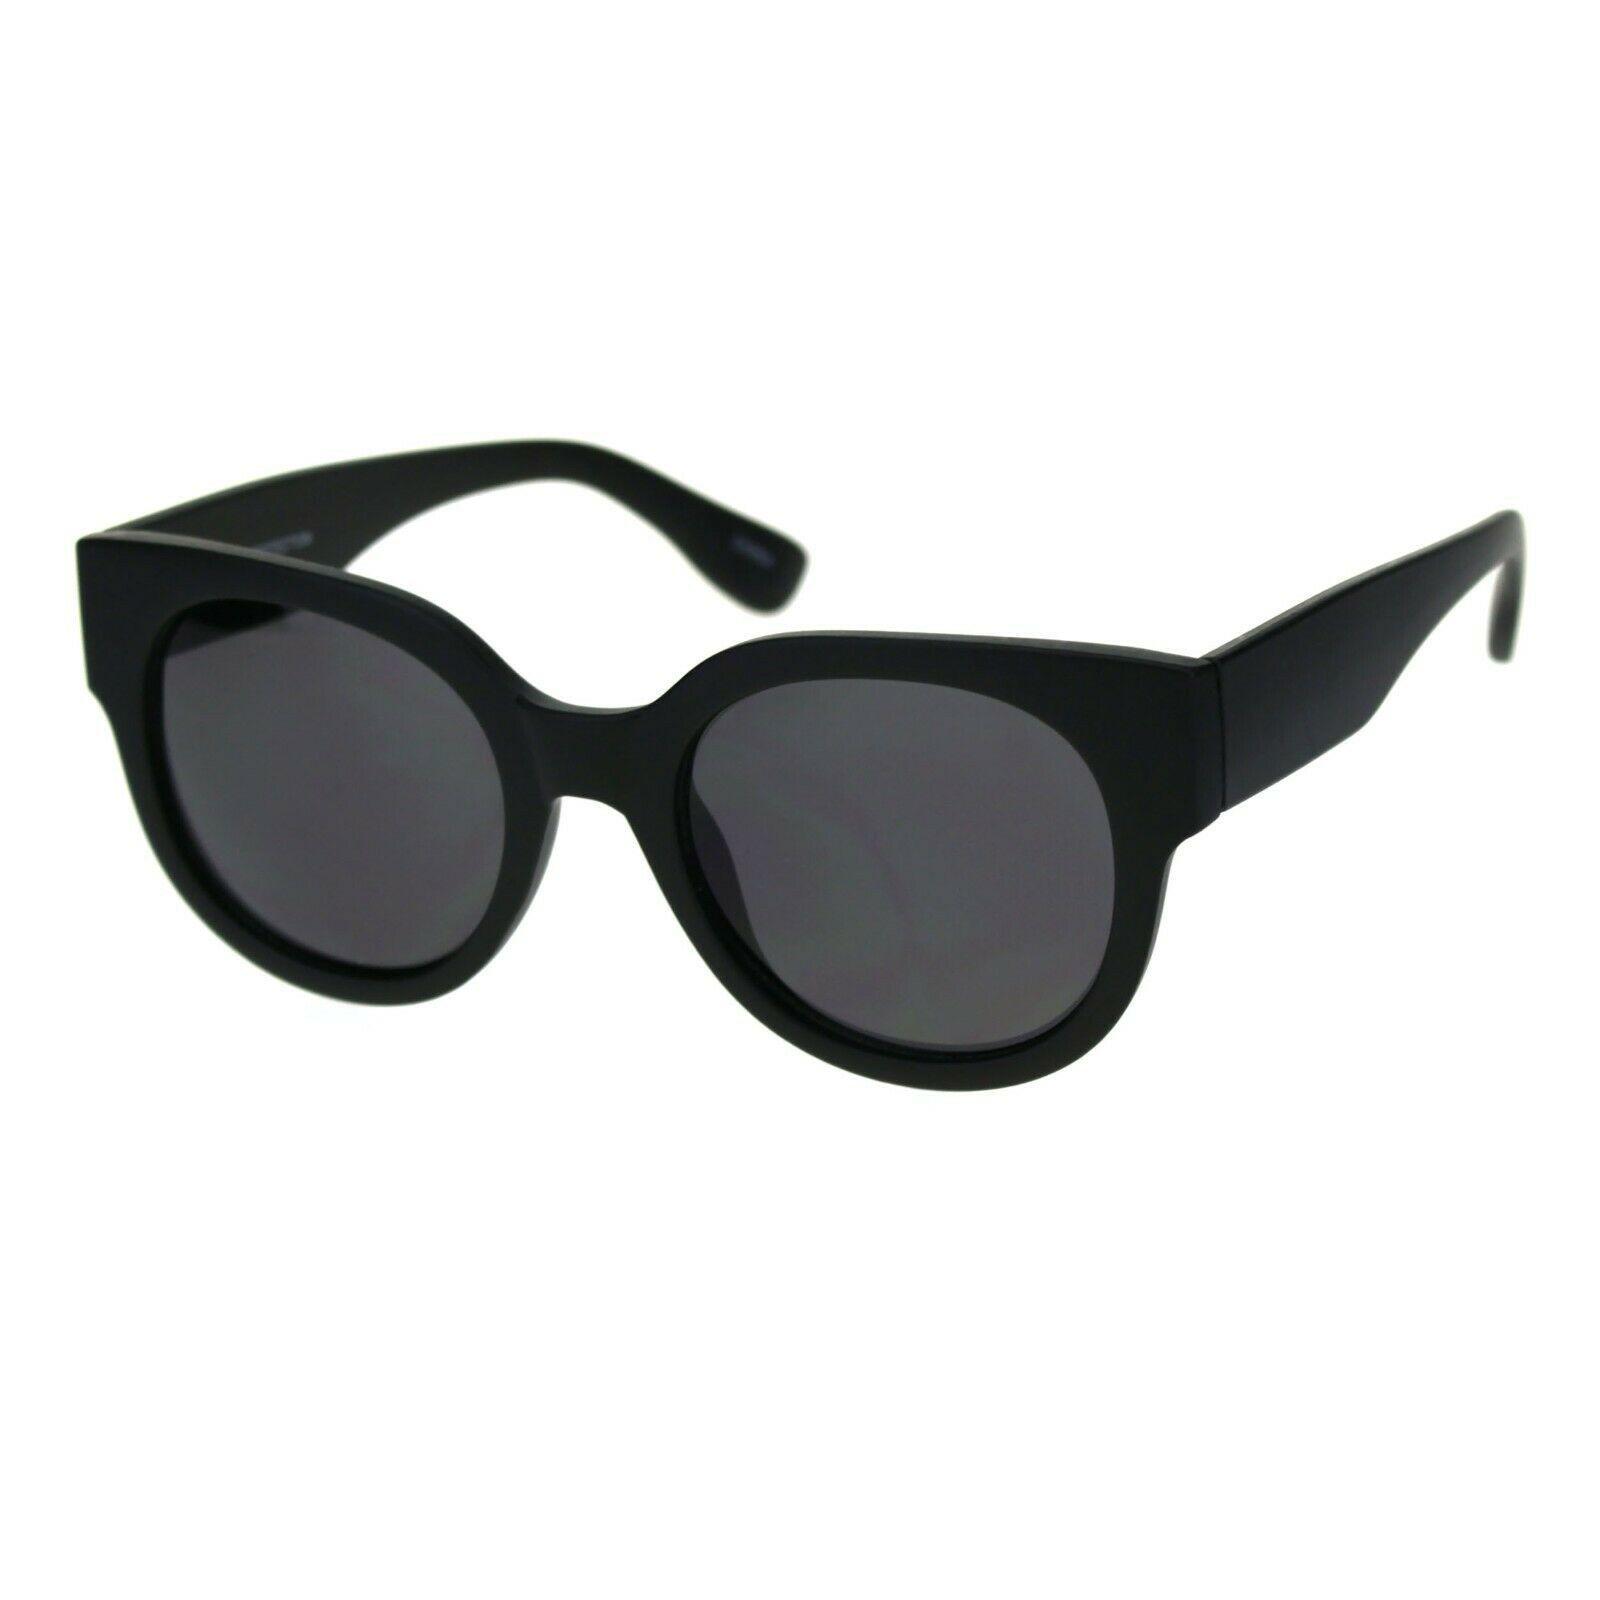 Womens Round Horn Rim Sunglasses Trendy Retro Fashion Shades UV 400